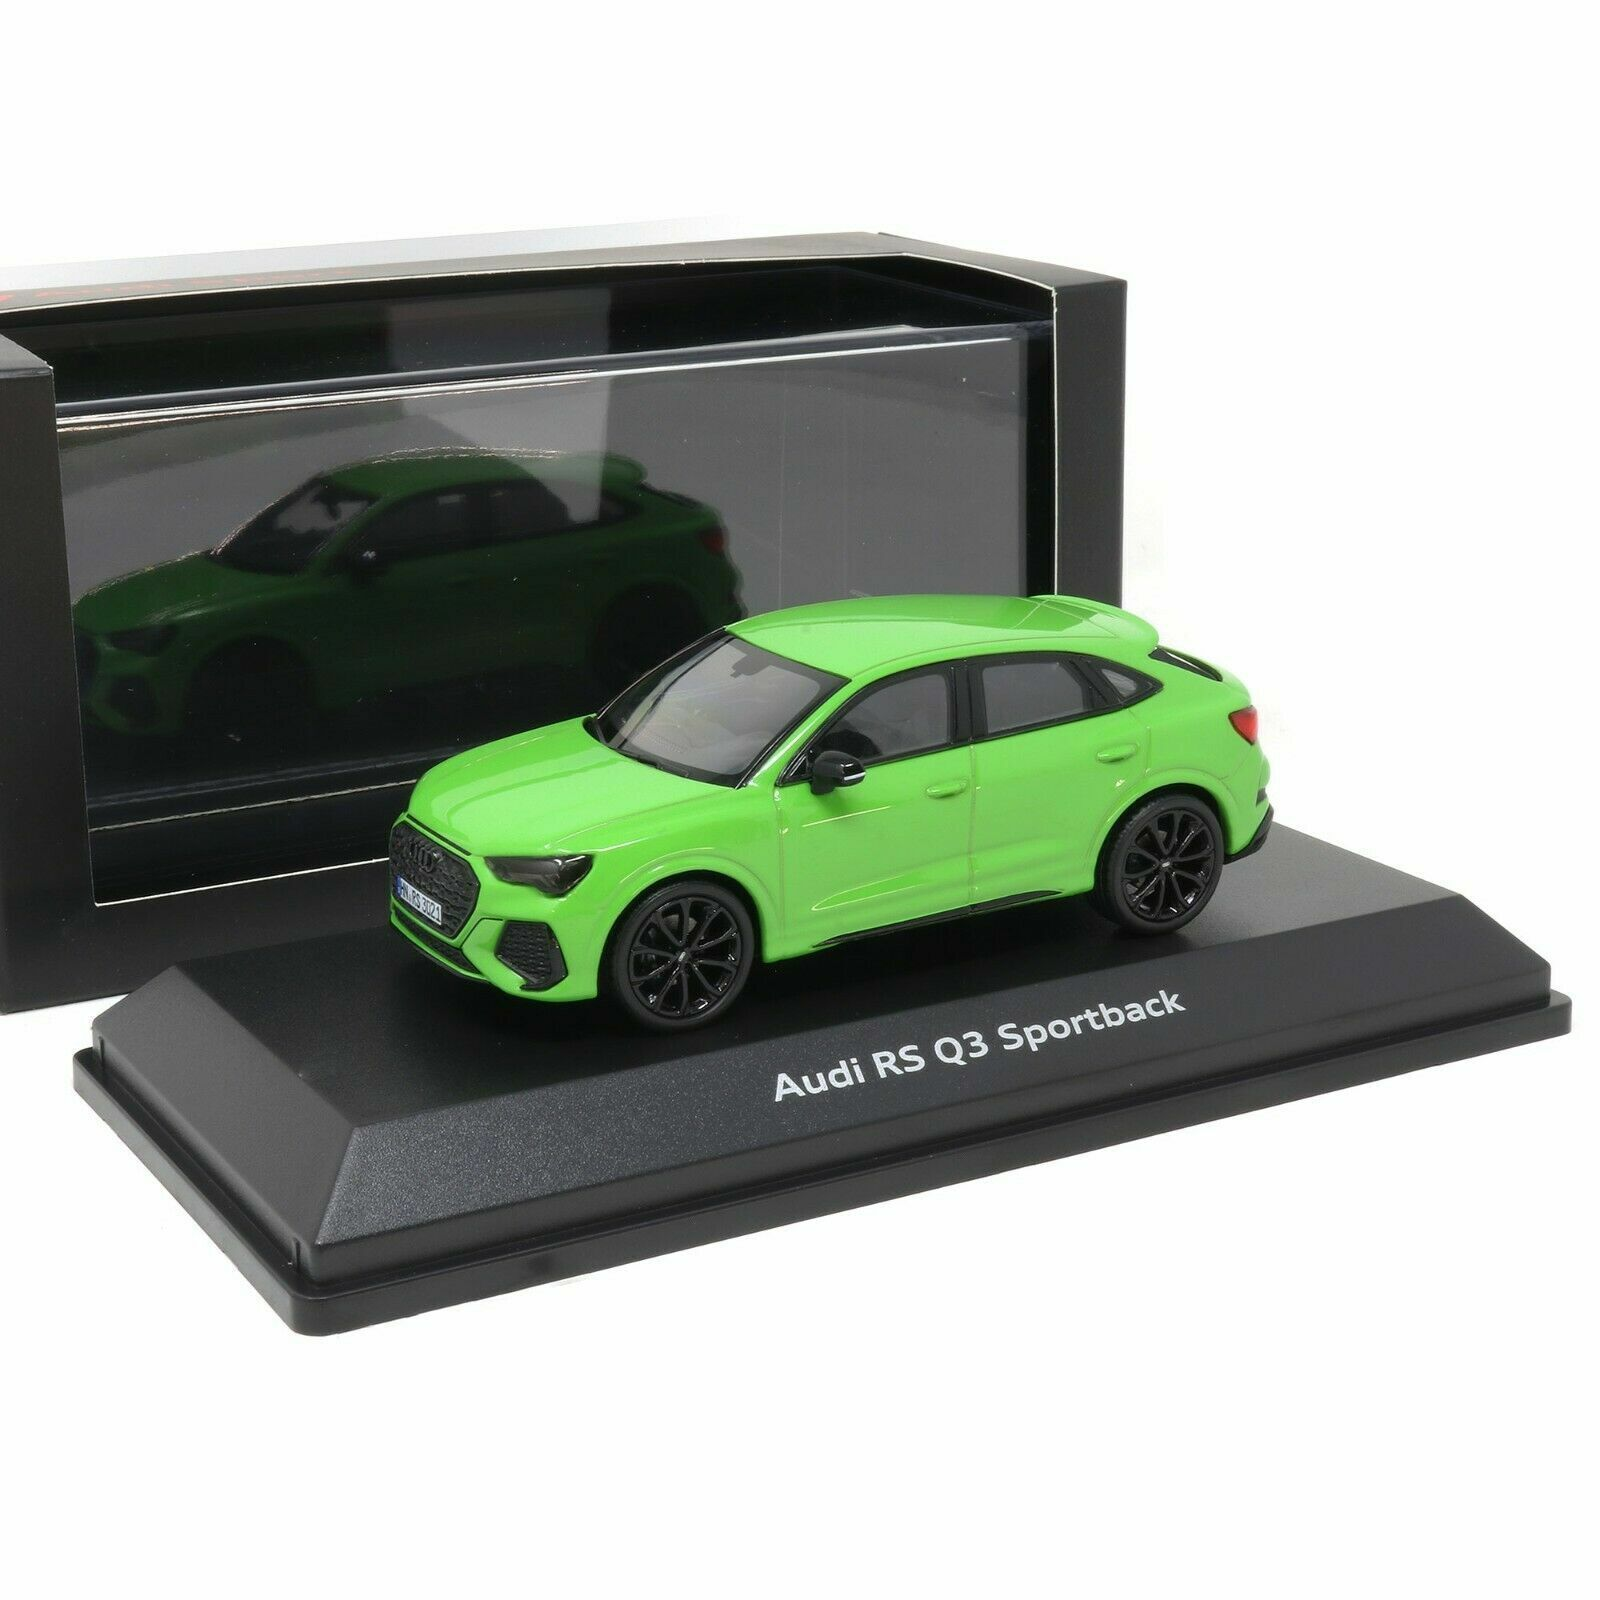 Audi Rs Q3 Sportback 1 43 Kyalami Green Model Car 5012013631 Genuine New 2160000052787 Ebay